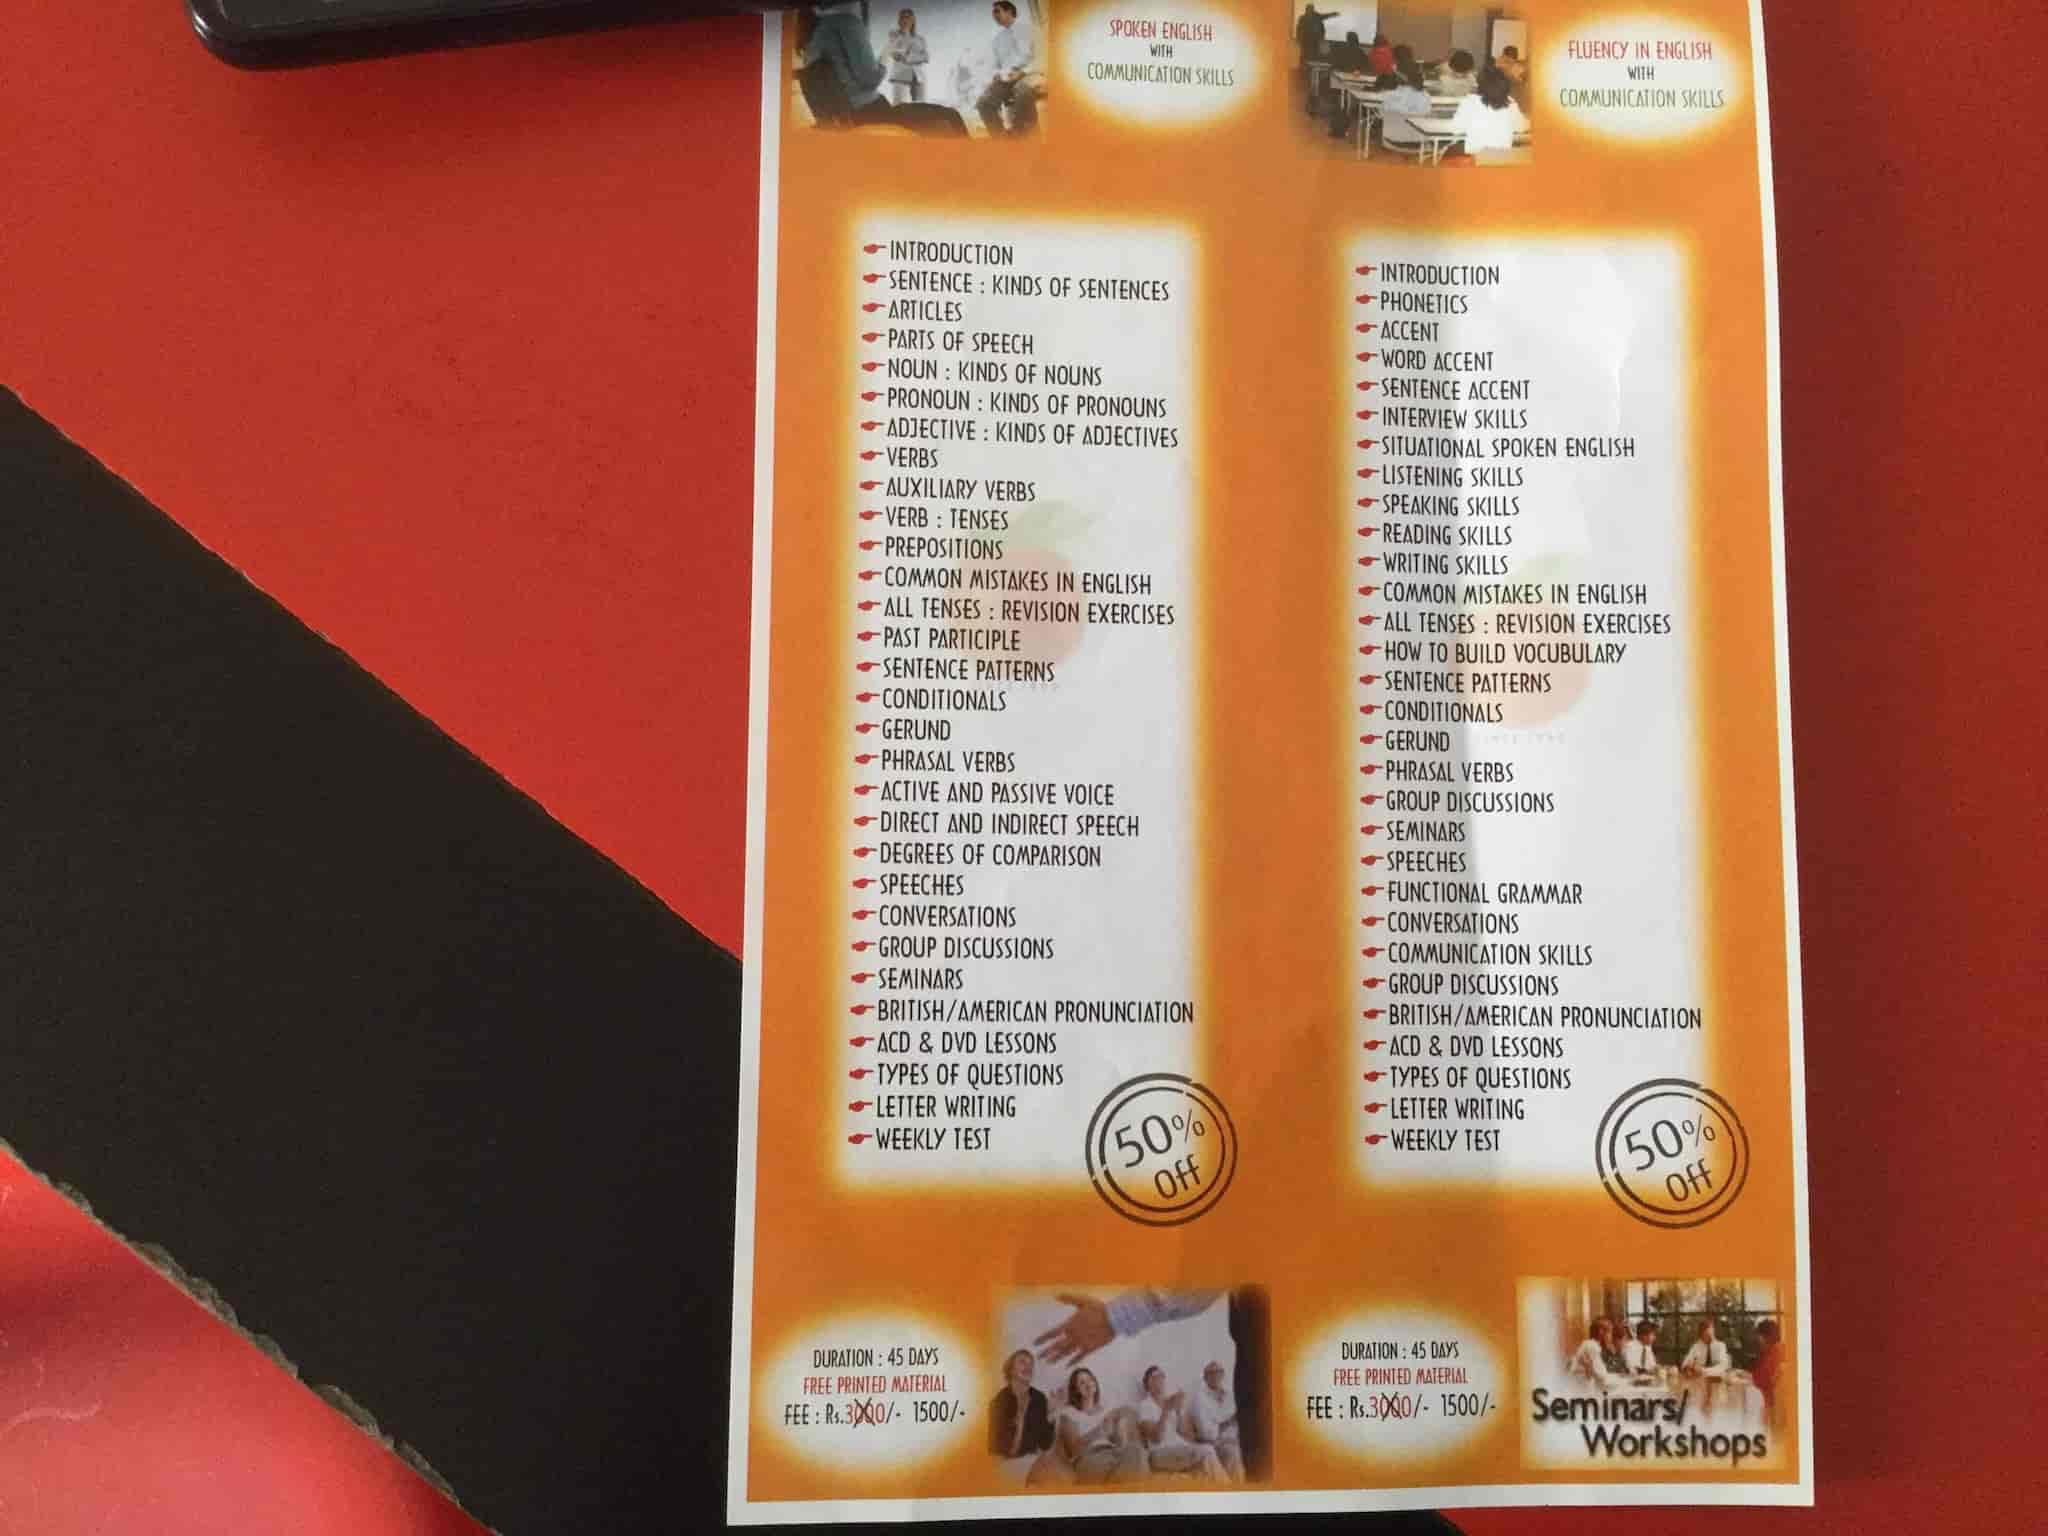 Orange Spoken English Photos, Vanasthalipuram, Hyderabad- Pictures